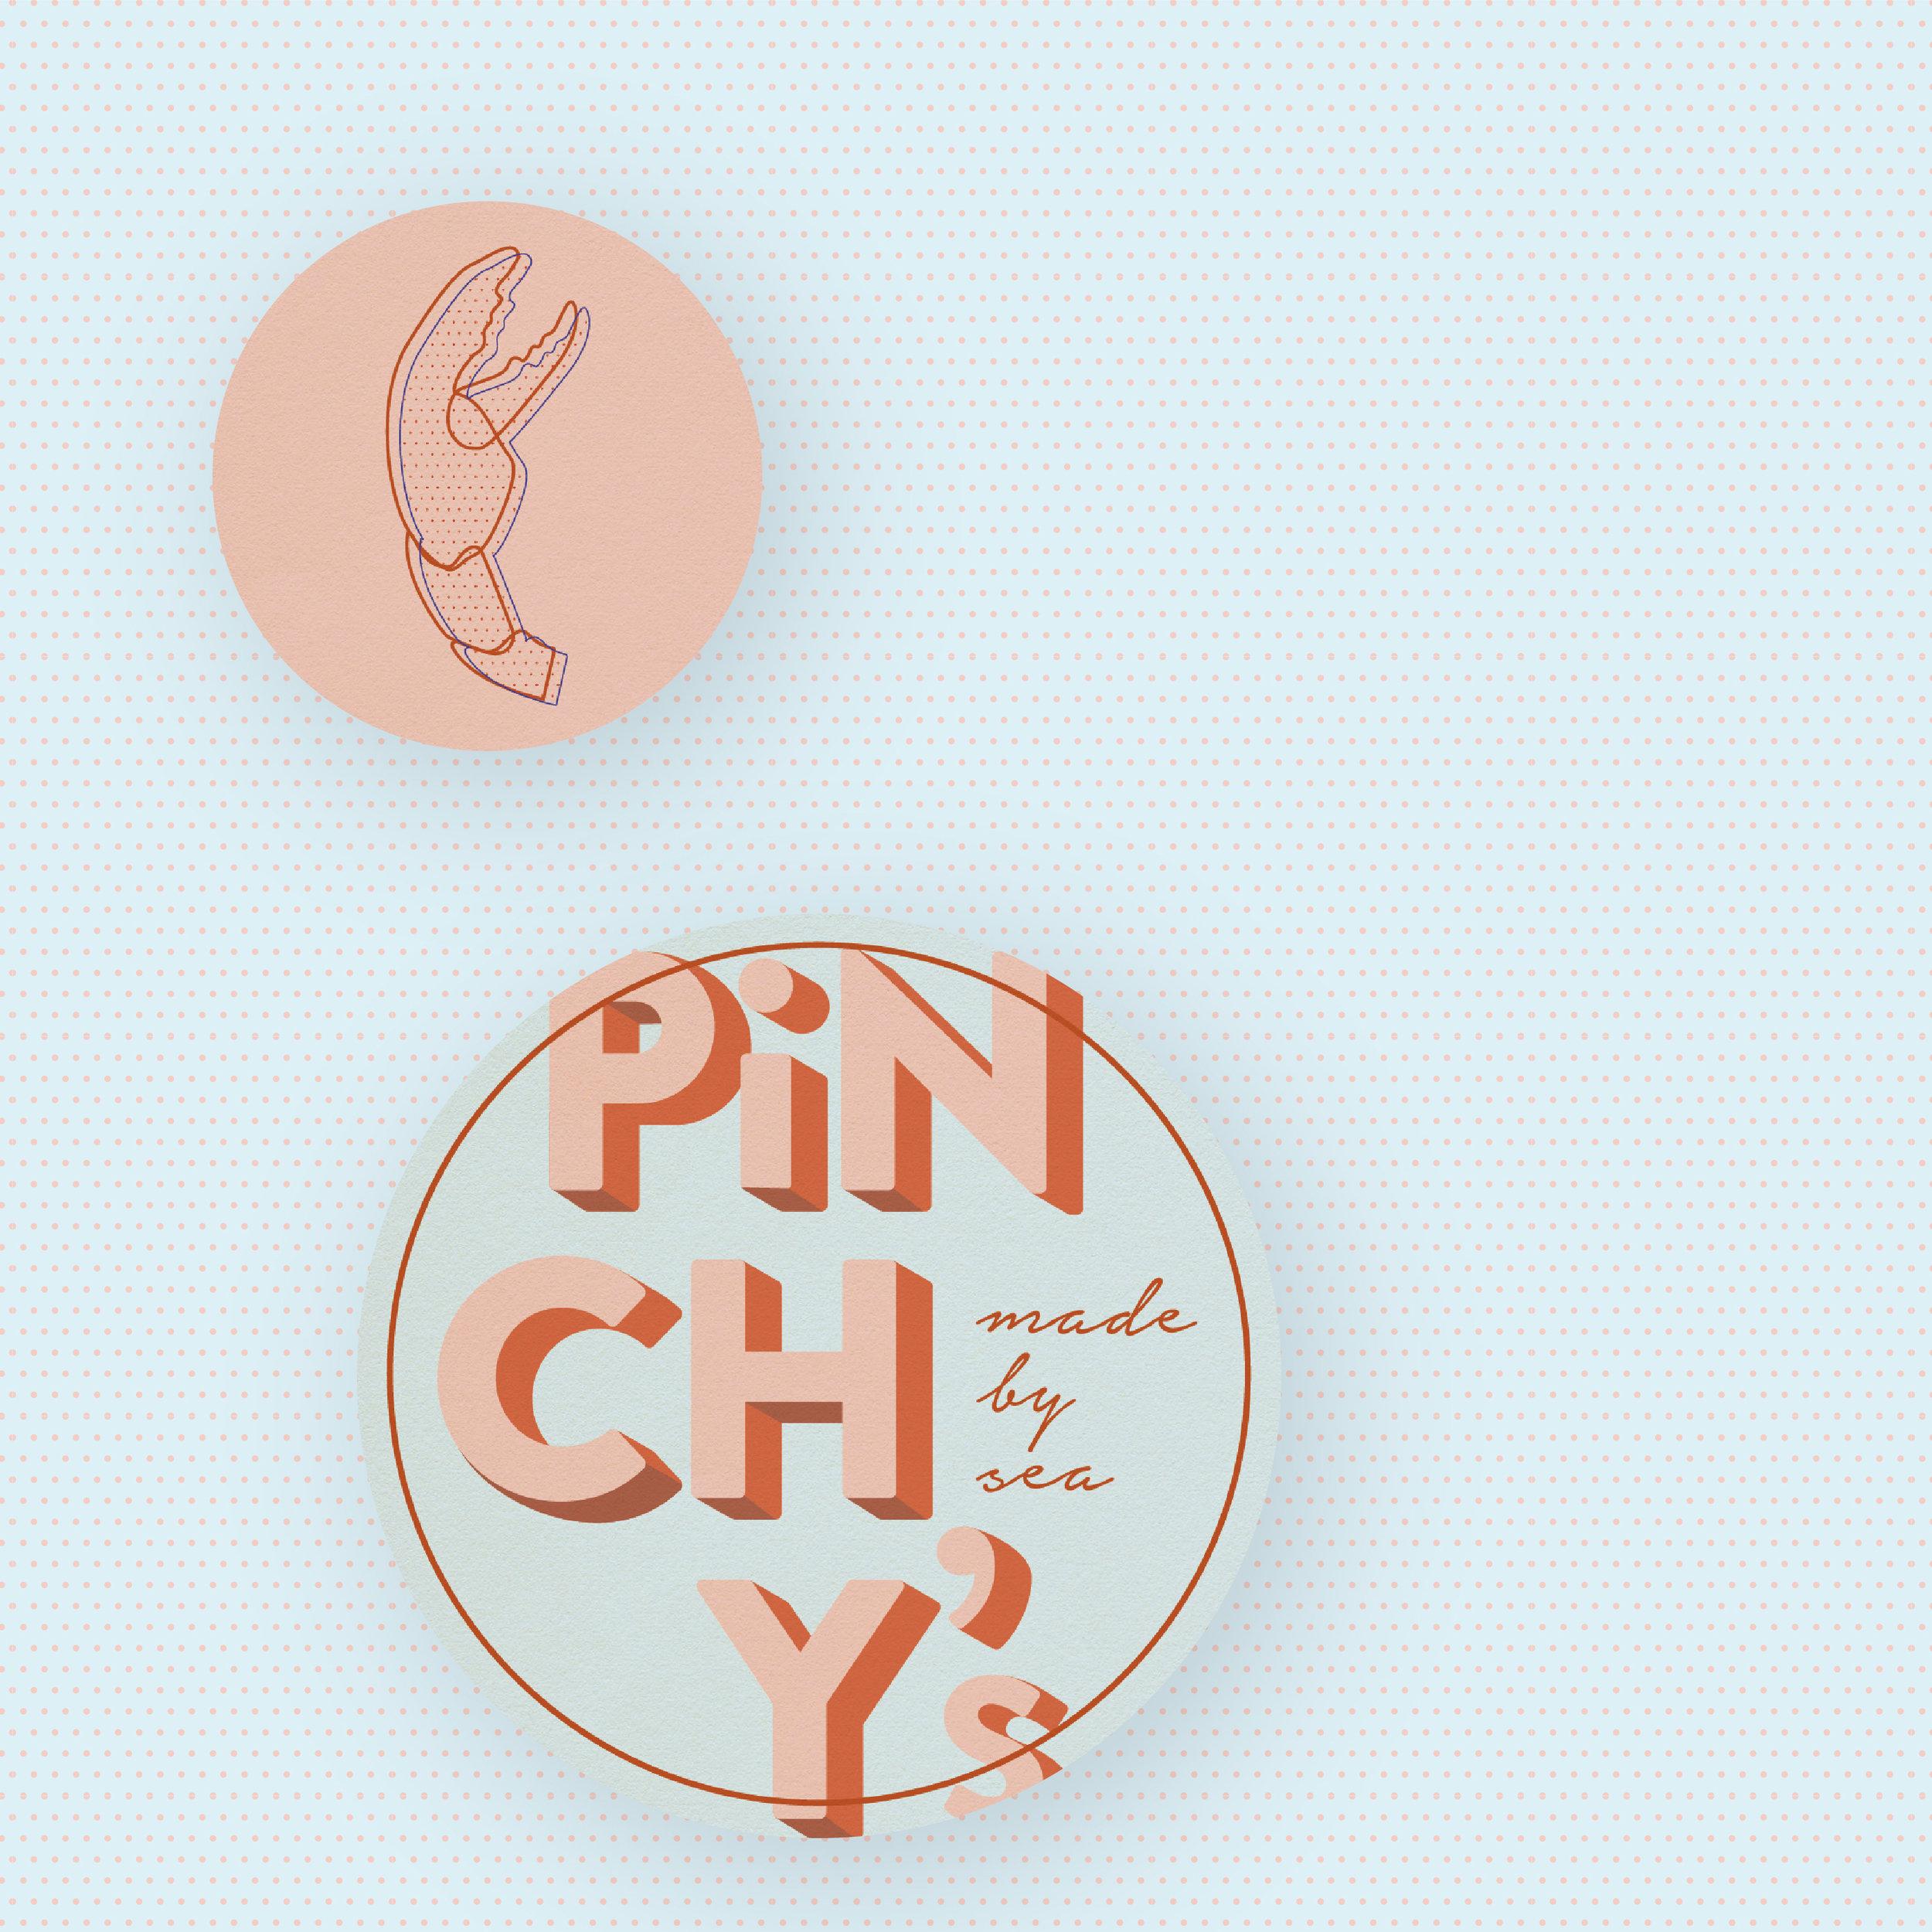 pinchys-10.jpg